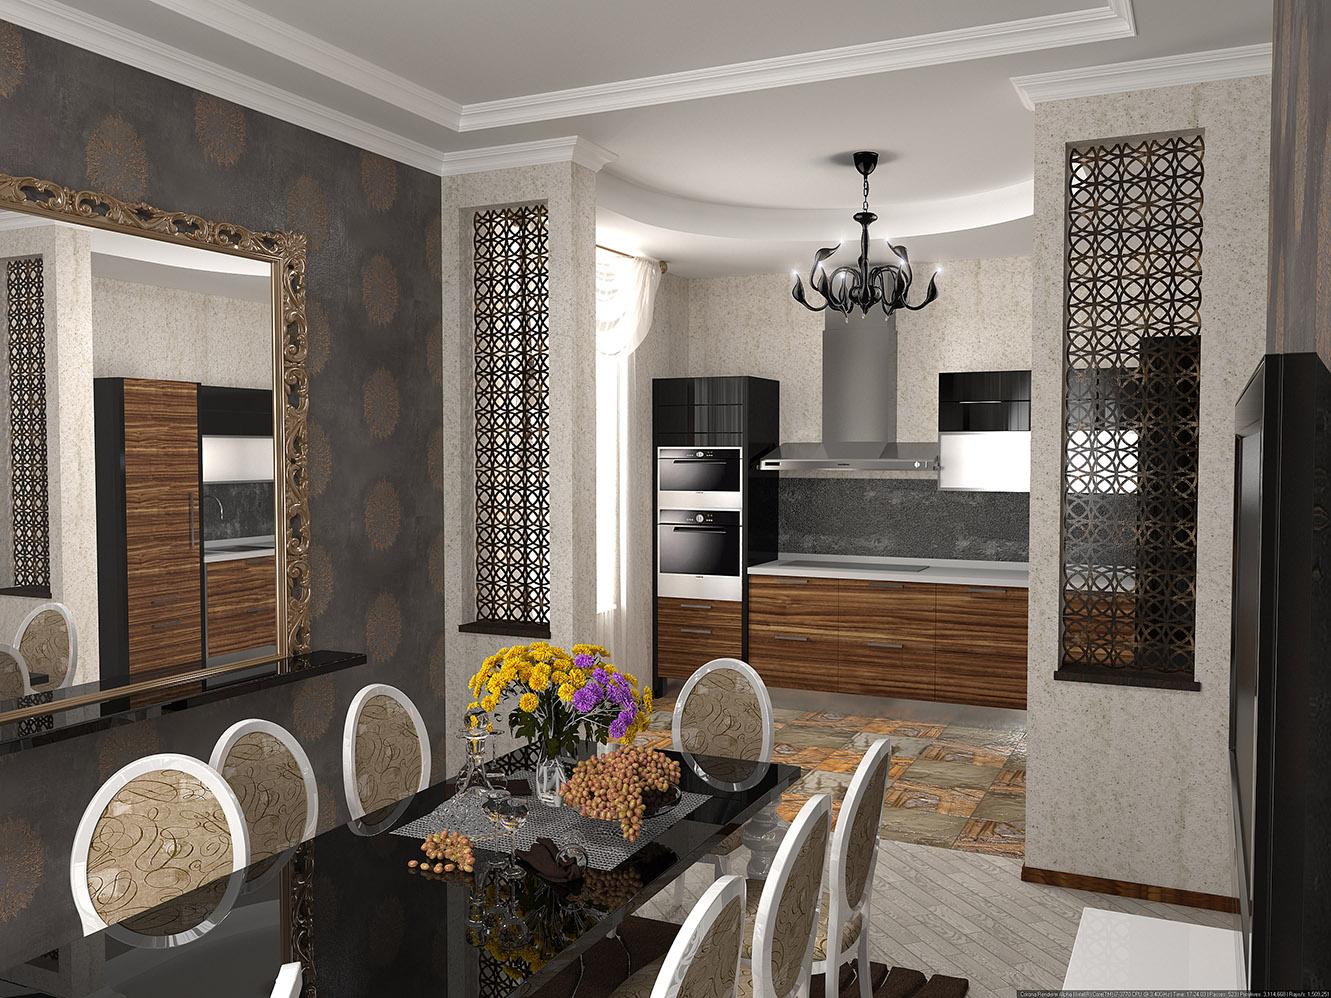 интерьер кухни с элементами стиля арт деко